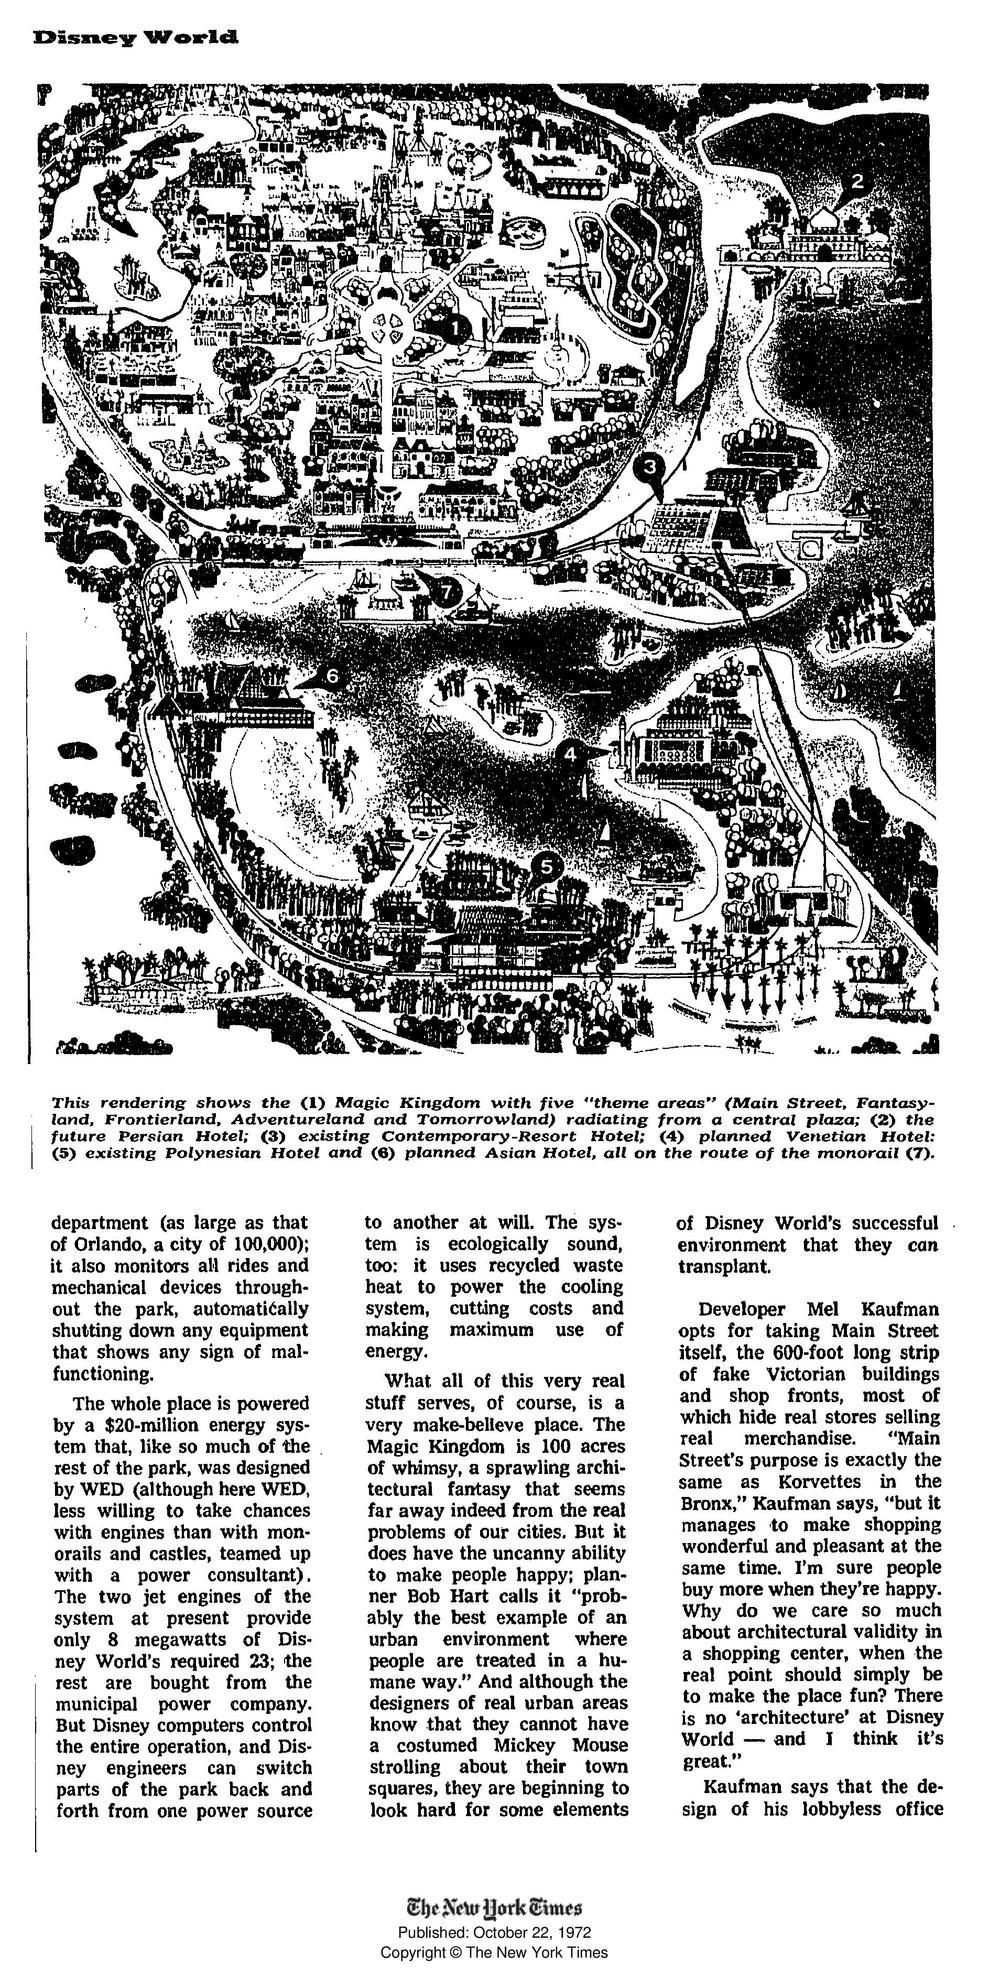 wdw1972-page-005.jpg